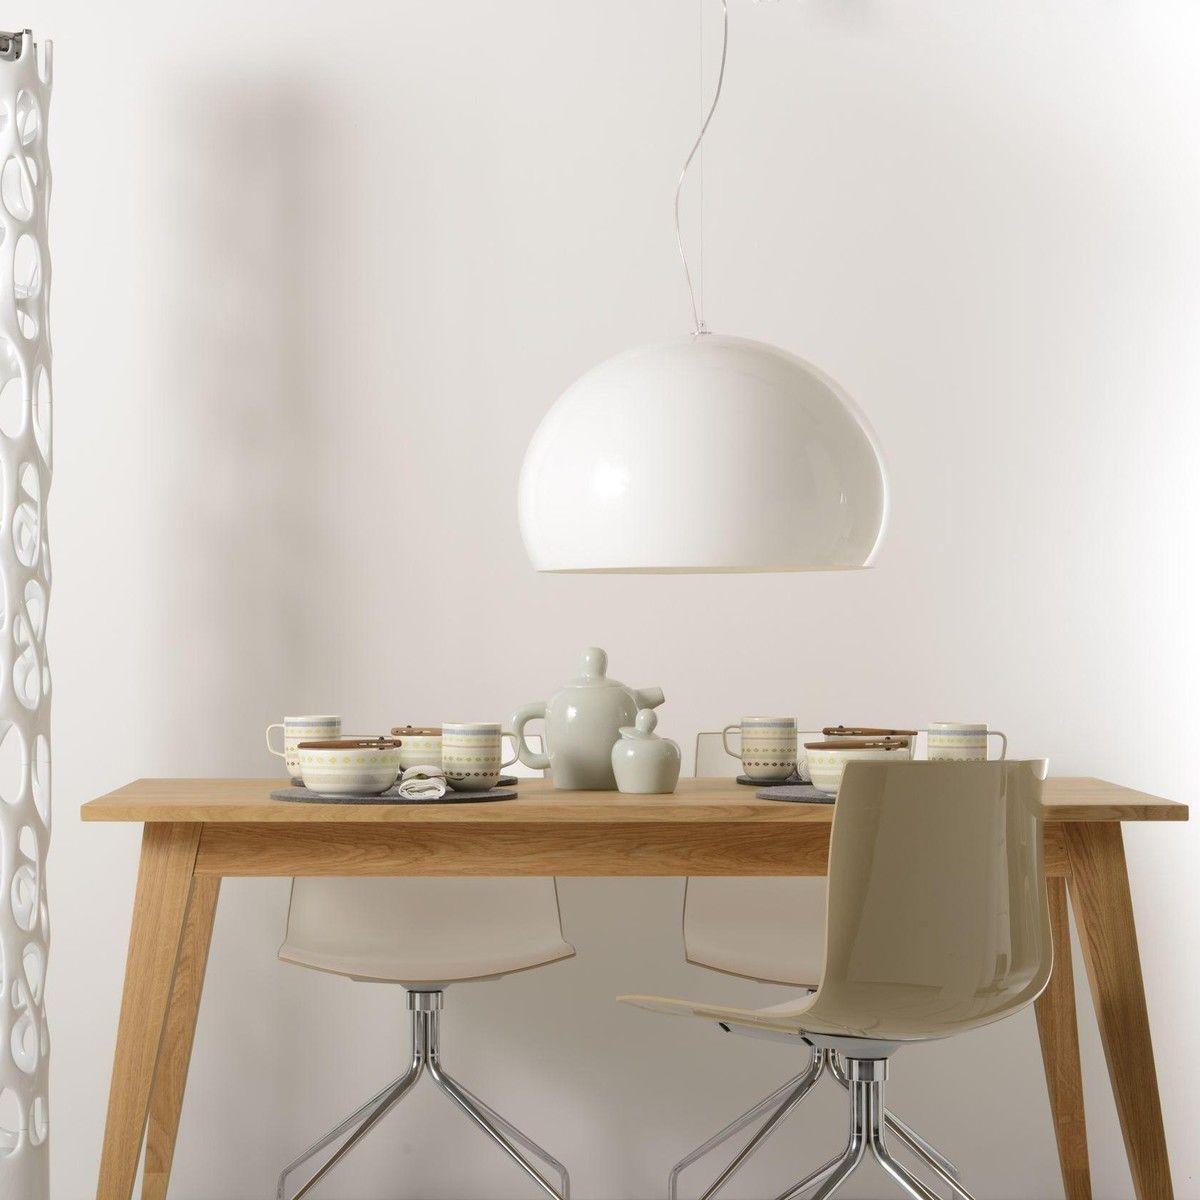 xaver massivholz esstisch jan kurtz. Black Bedroom Furniture Sets. Home Design Ideas